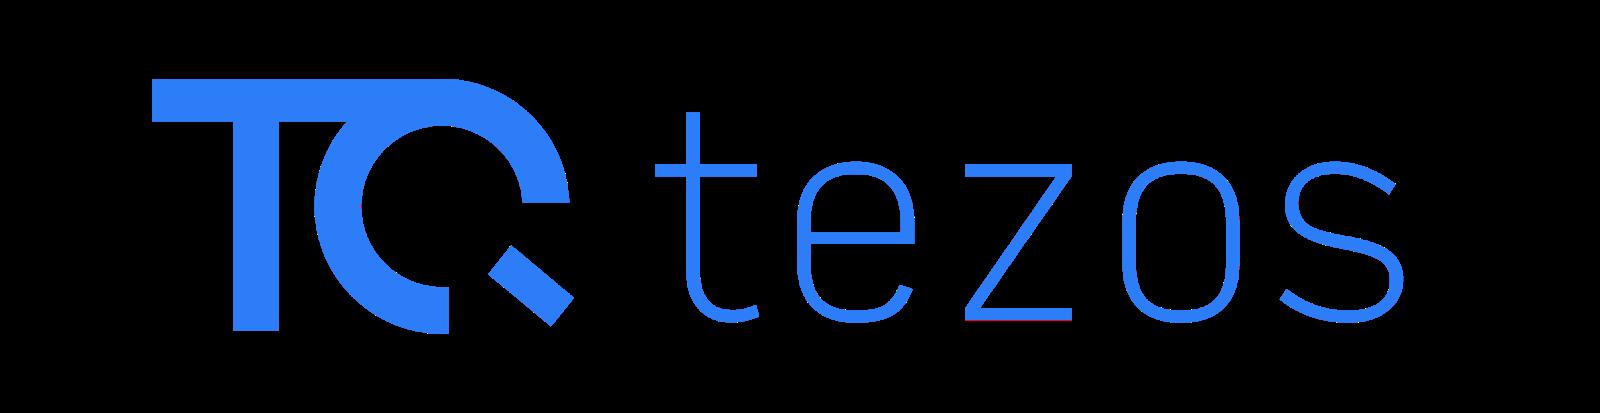 TQ Tezos - Remotely People